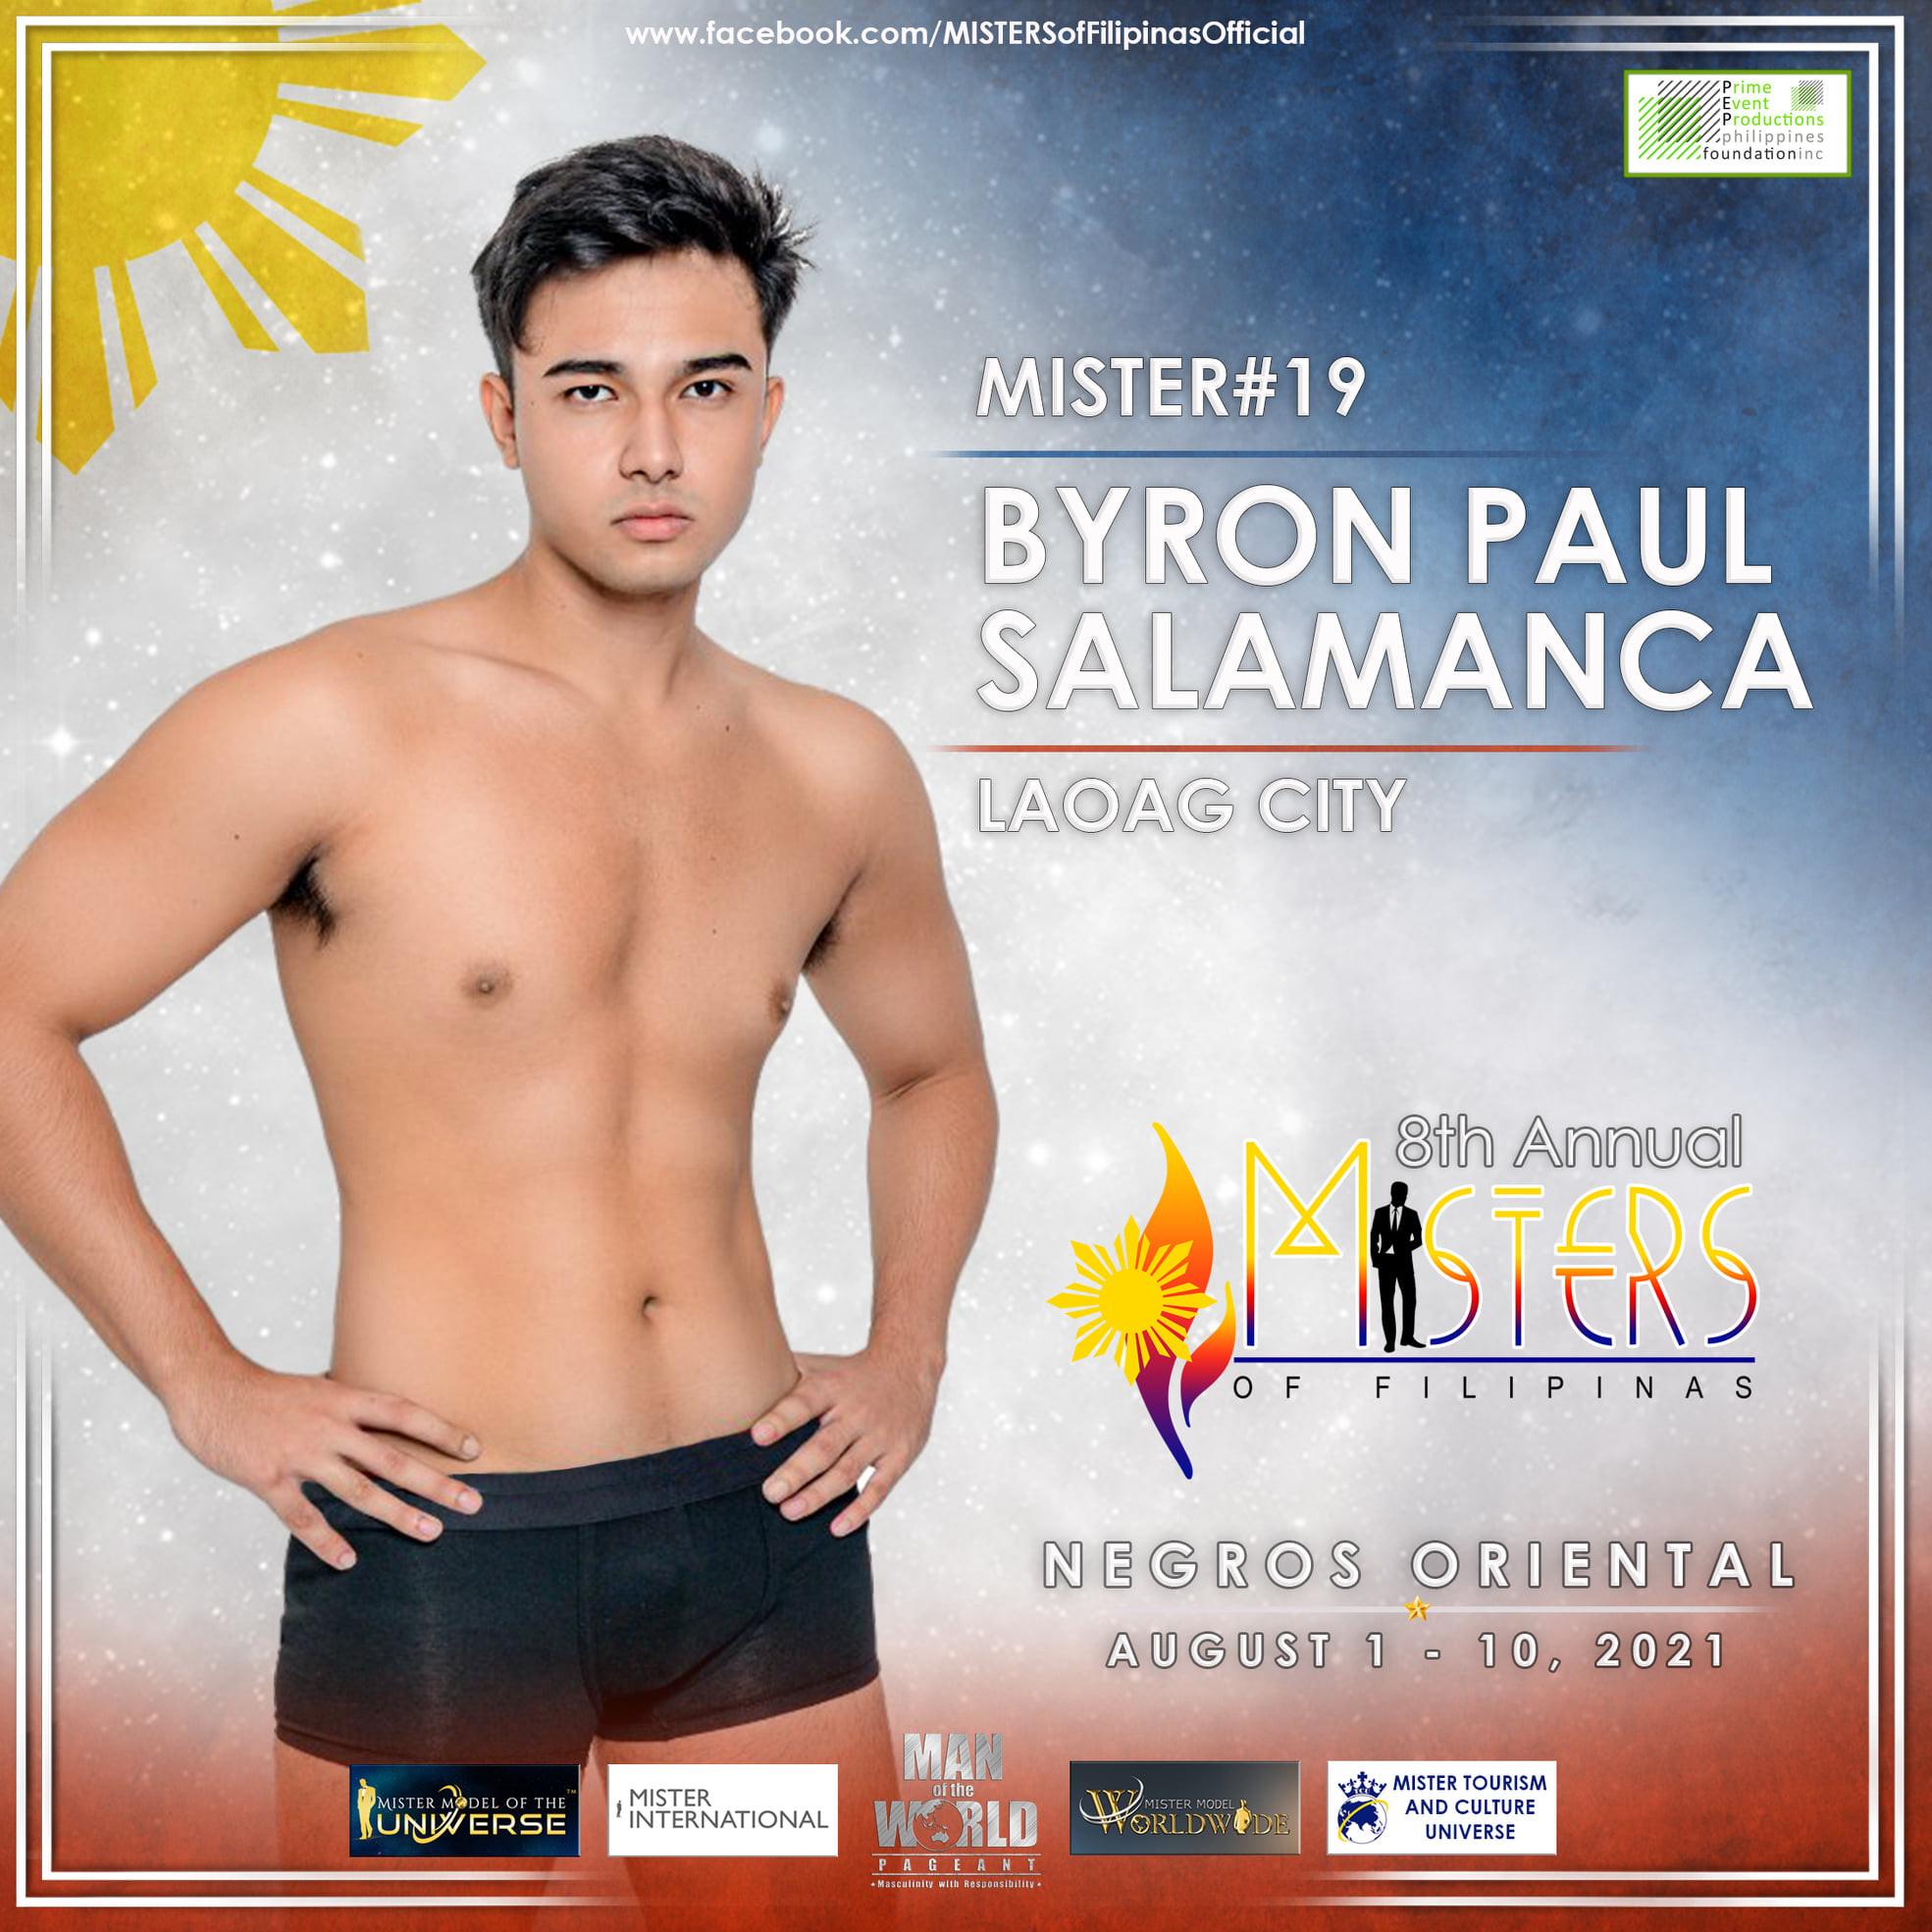 candidatos a misters of filipinas 2021. final: 27 agosto. - Página 2 OwoOqx